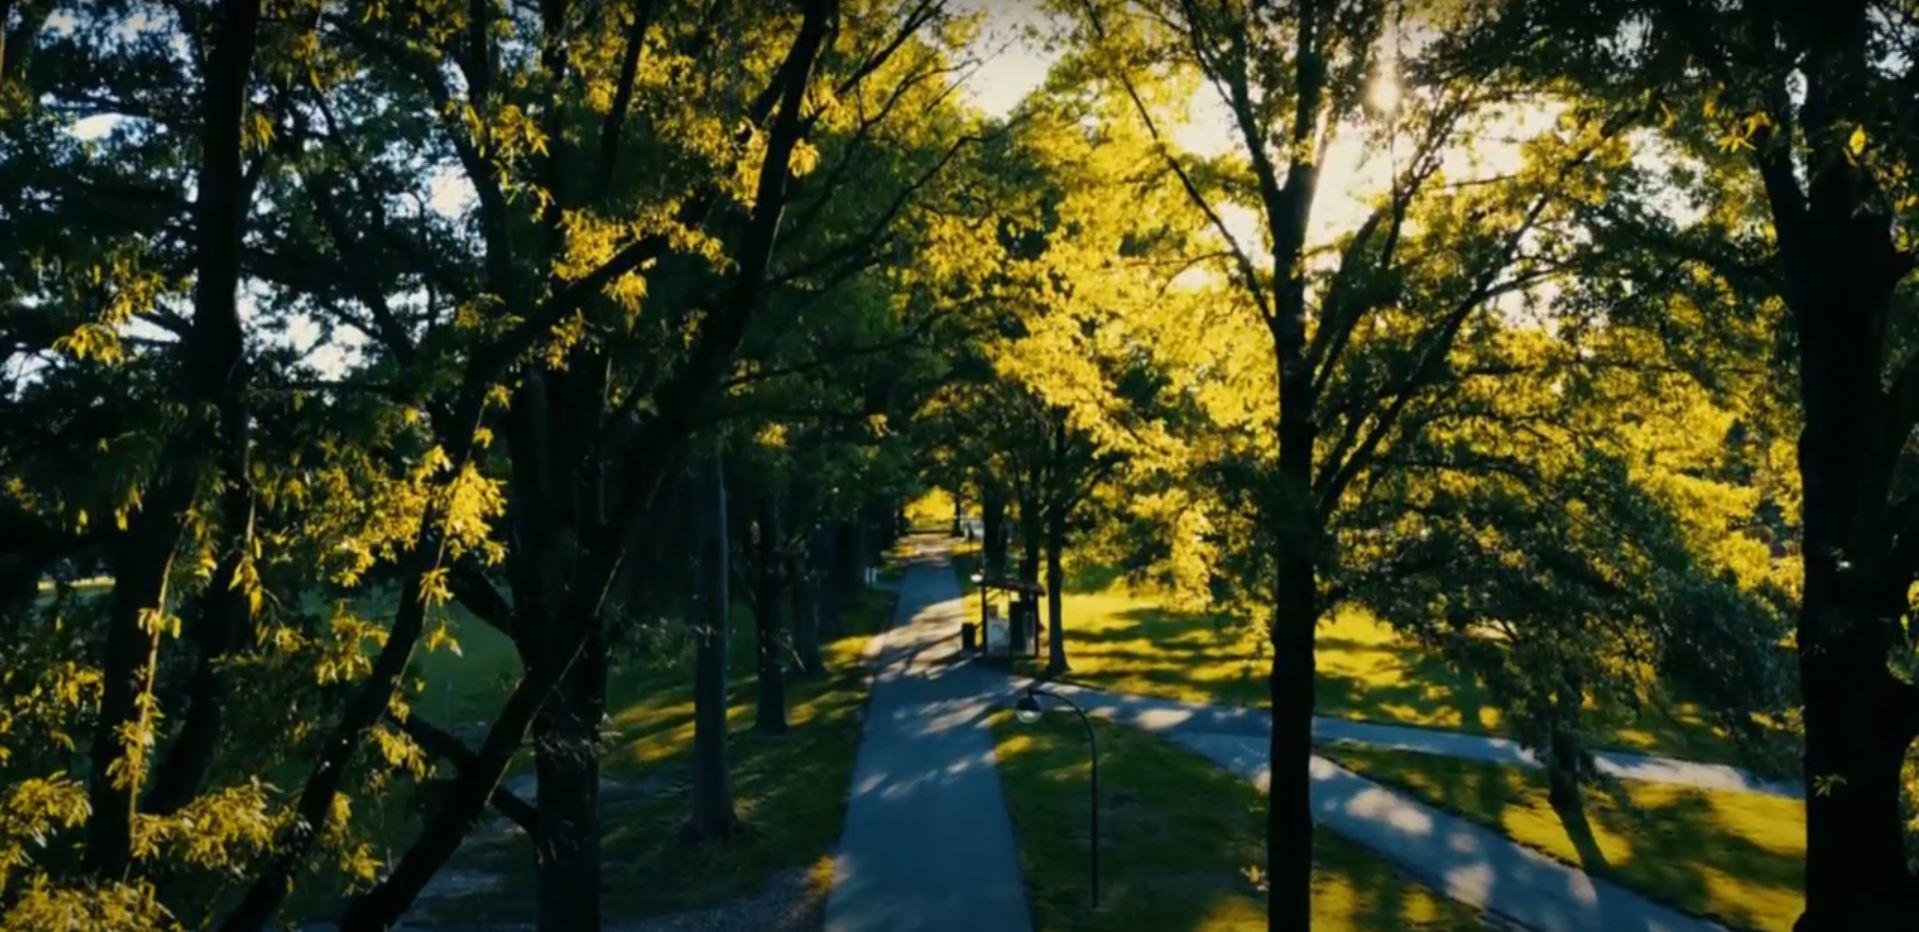 Mercer path